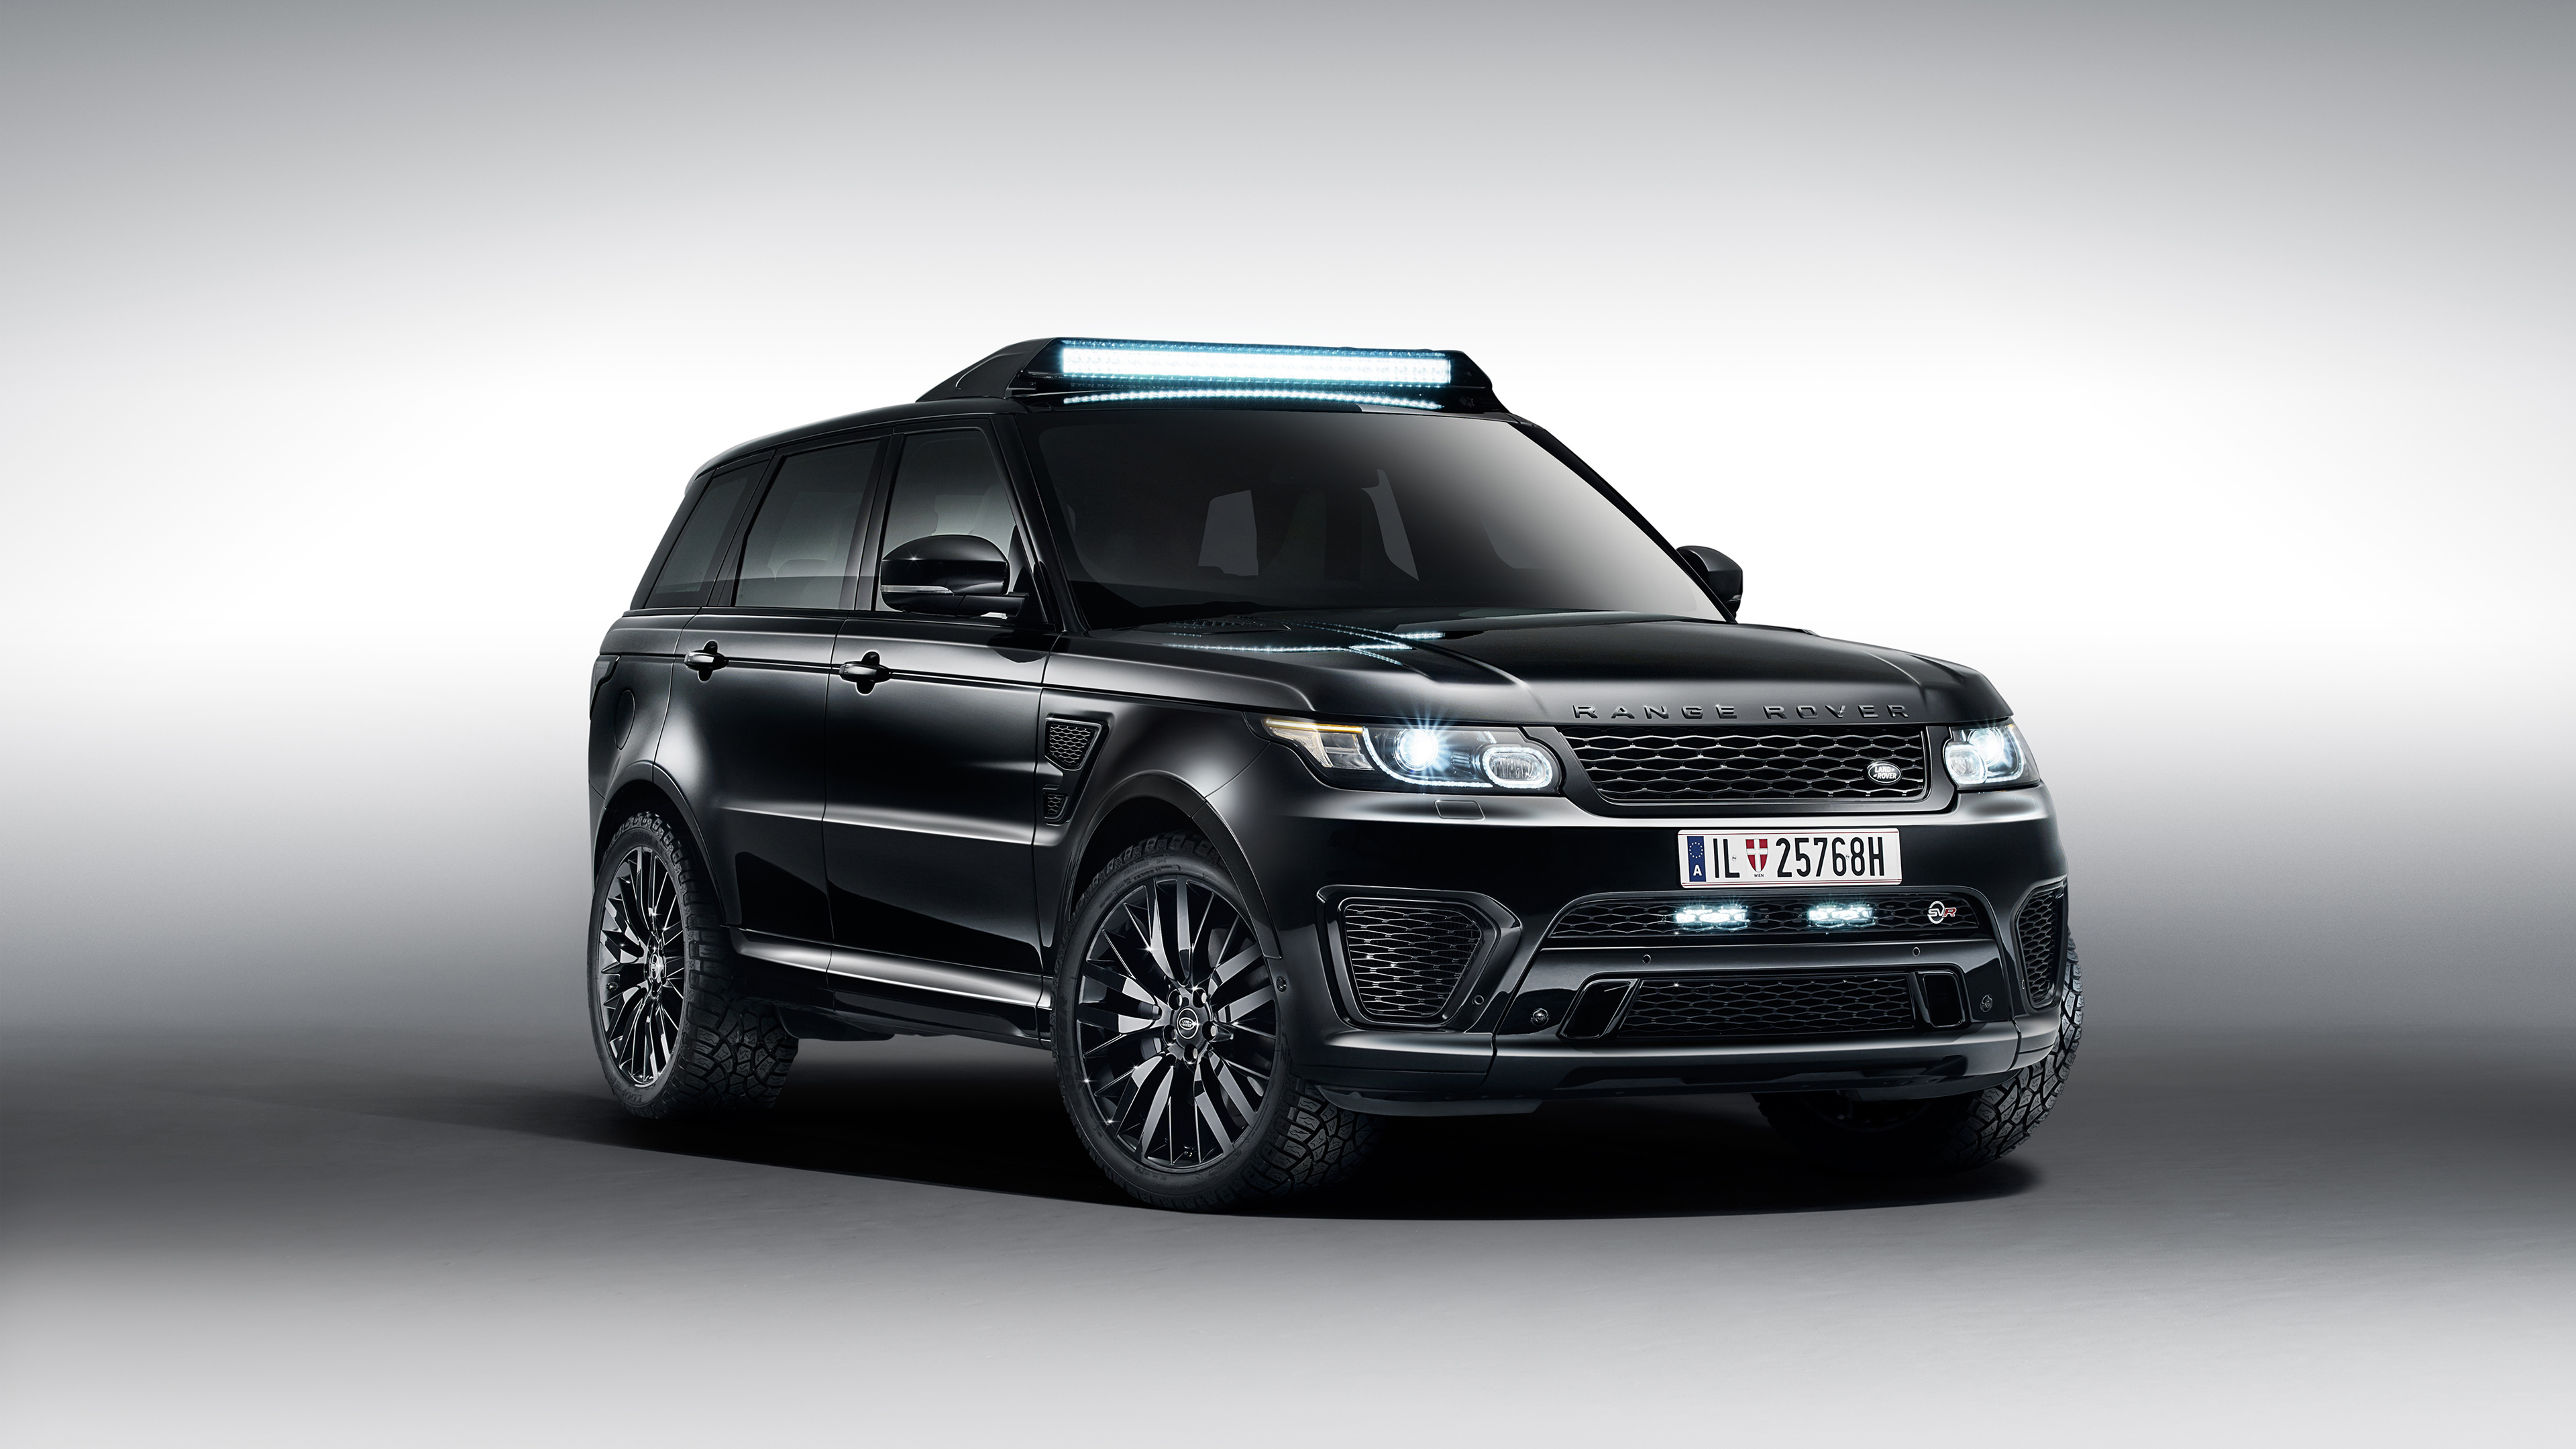 2011 land rover dc100 concept side 2 1280x960 wallpaper - Range Rover Sport 2015 Wallpaper Wallpapersafari